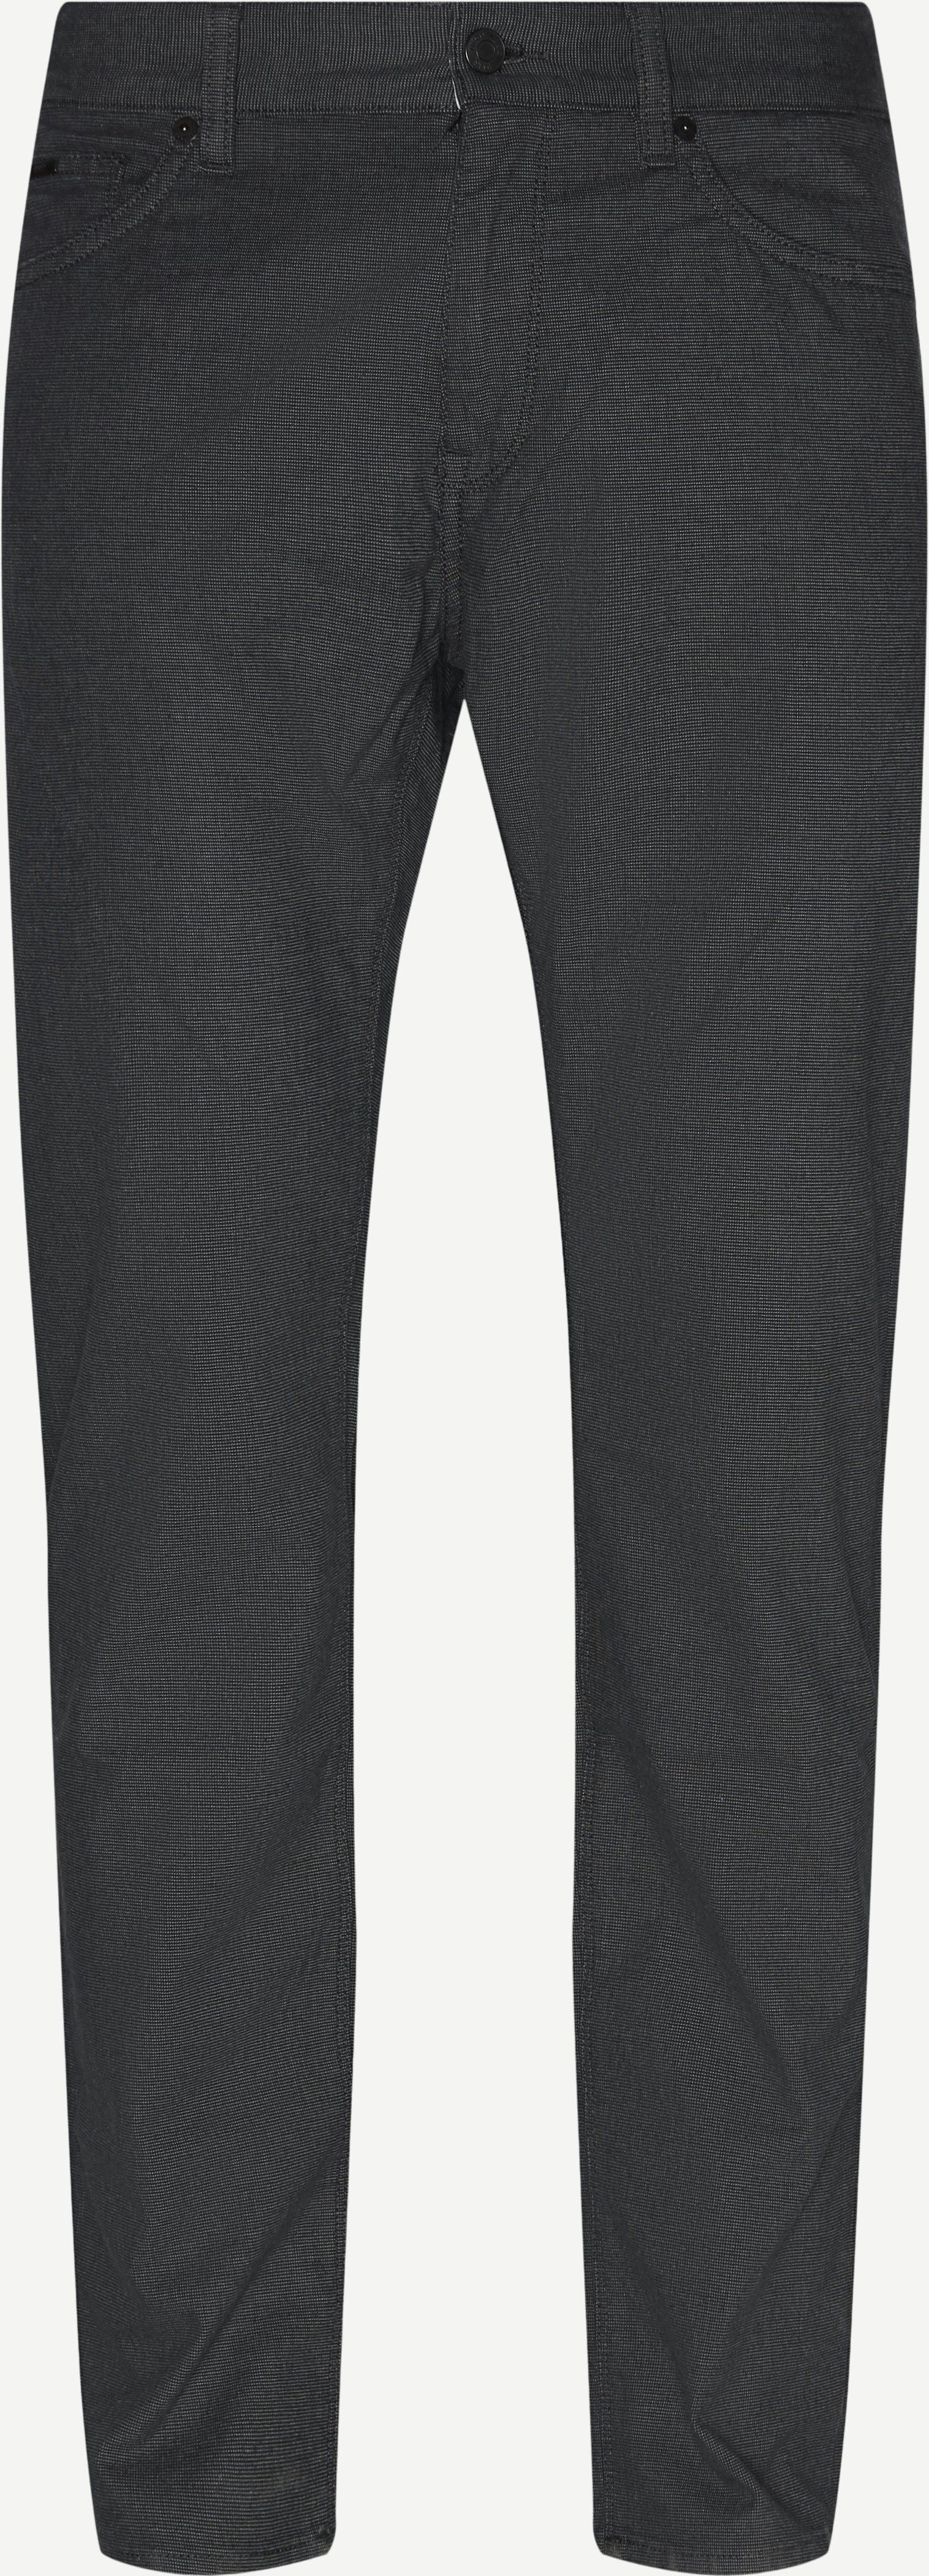 Maine3 Jeans - Jeans - Regular - Sort